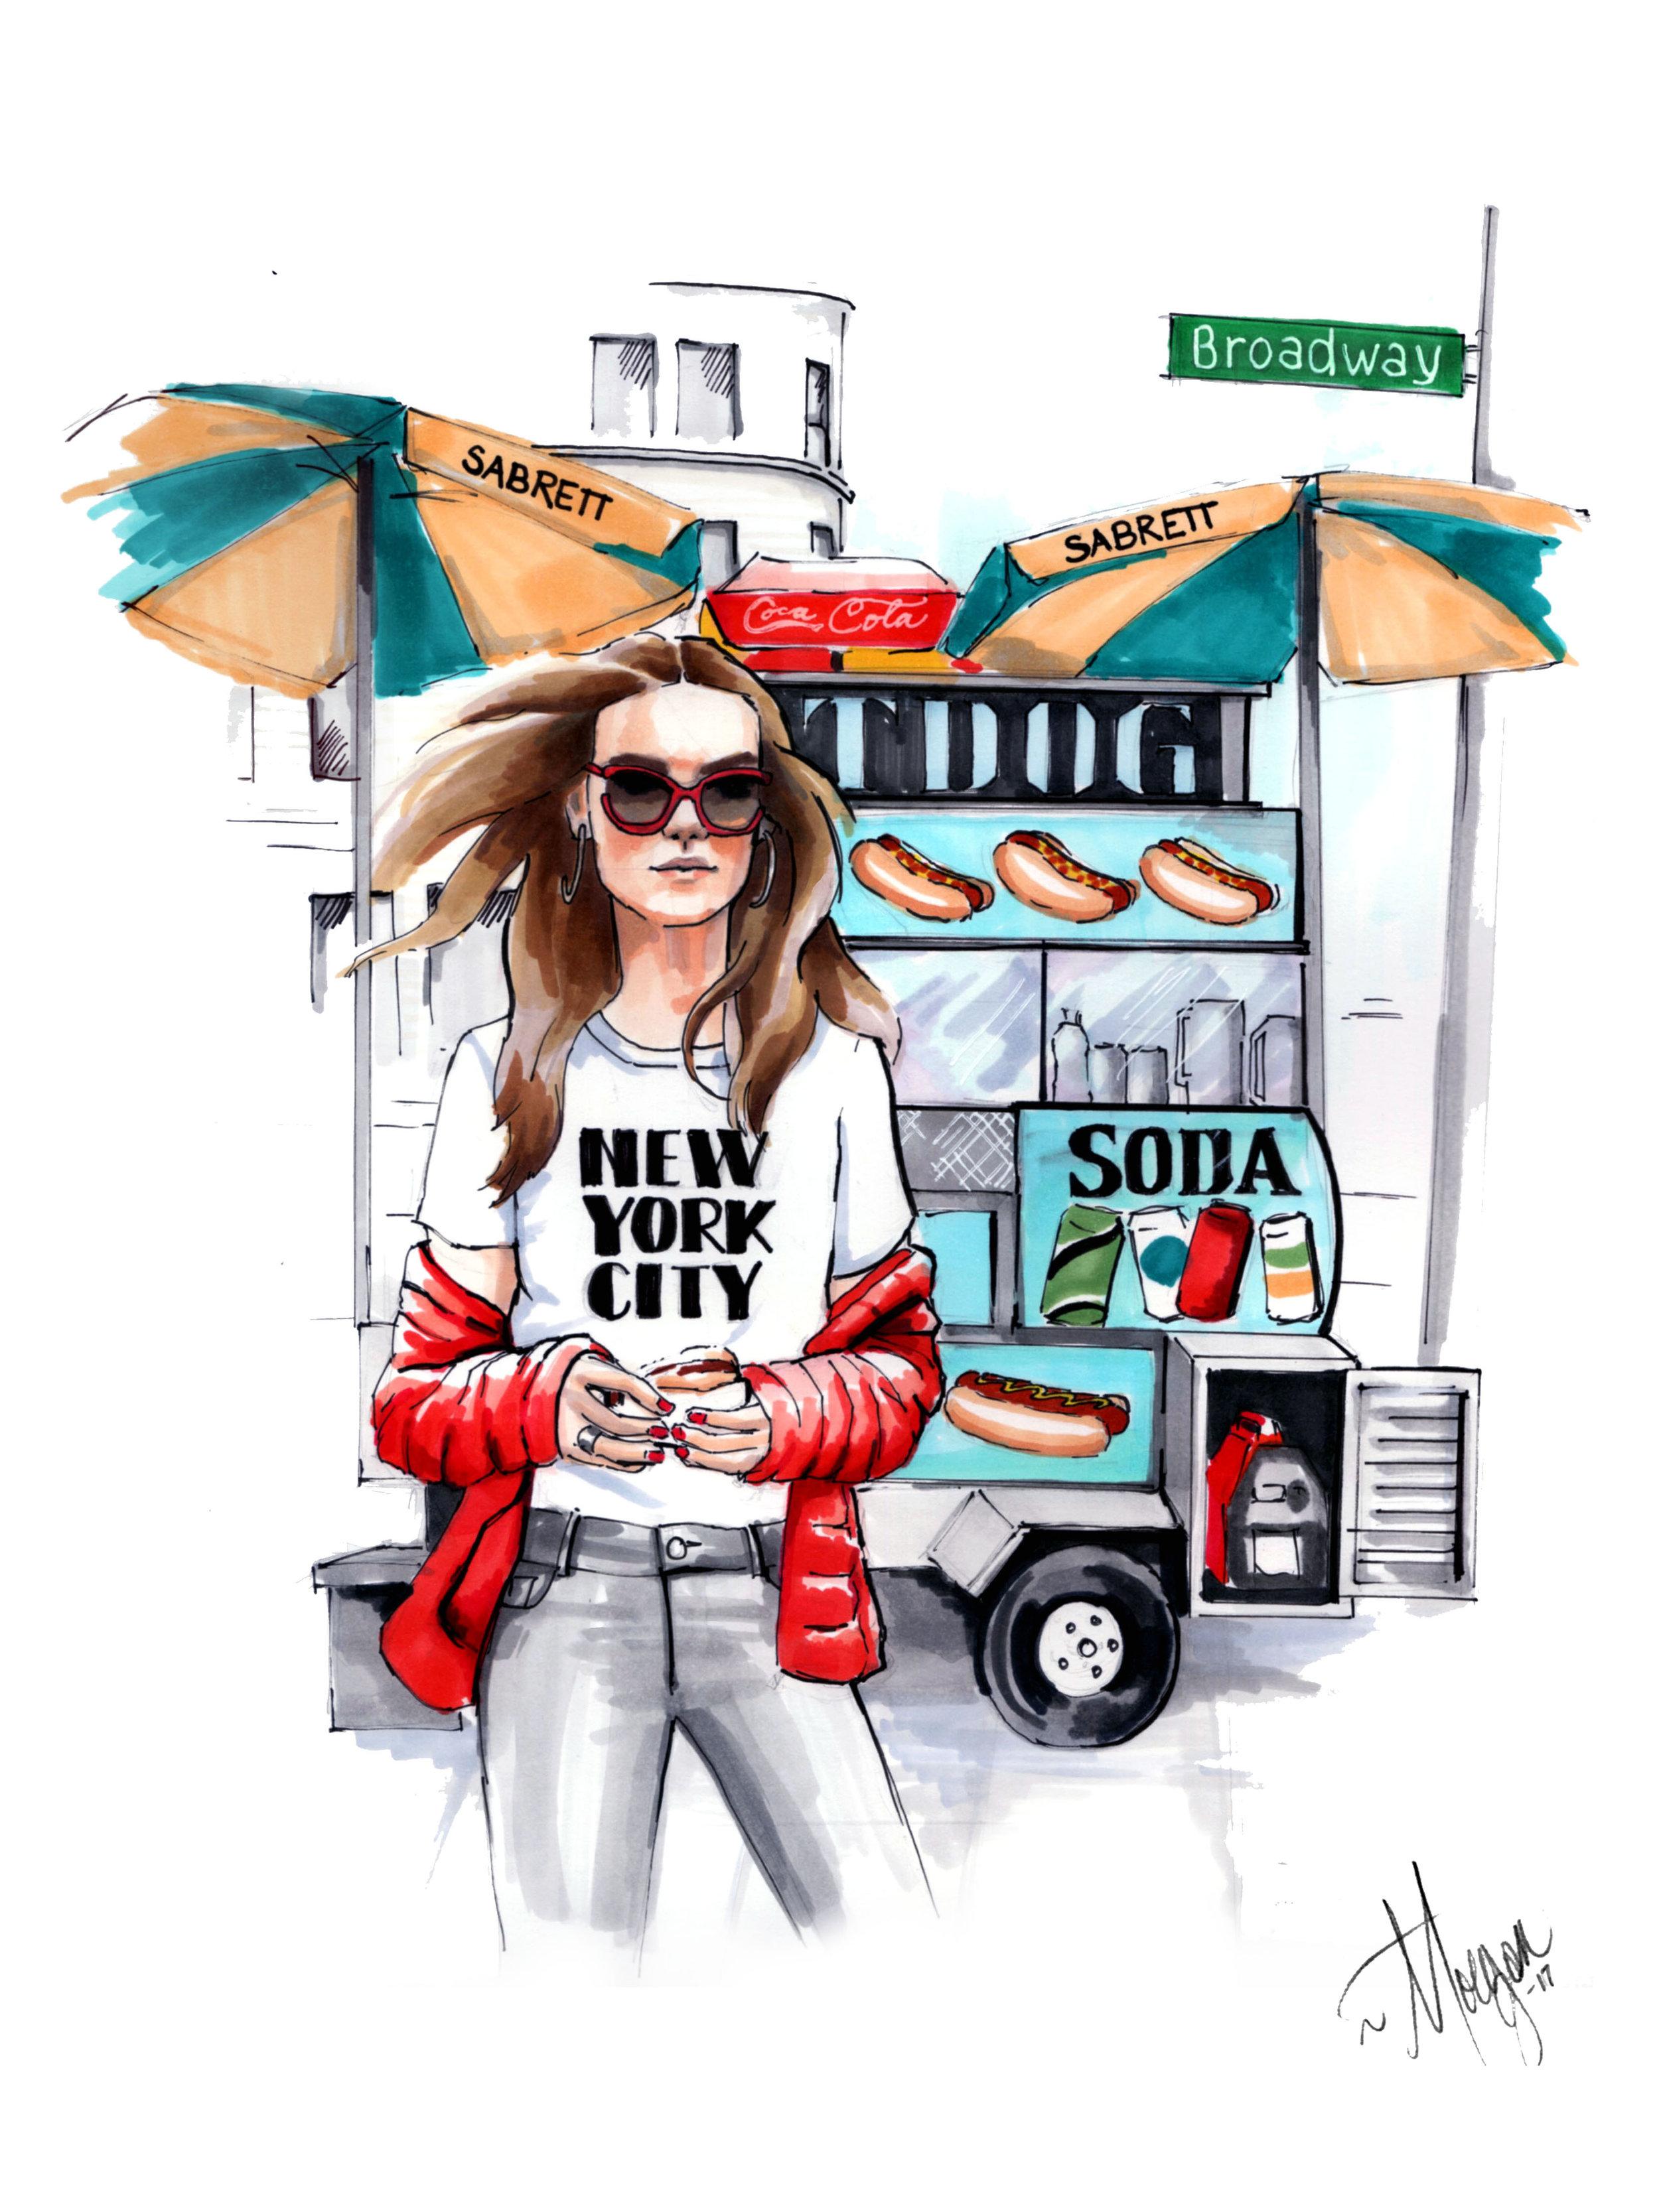 NYC-illustration-morgan-swank-studio.jpg